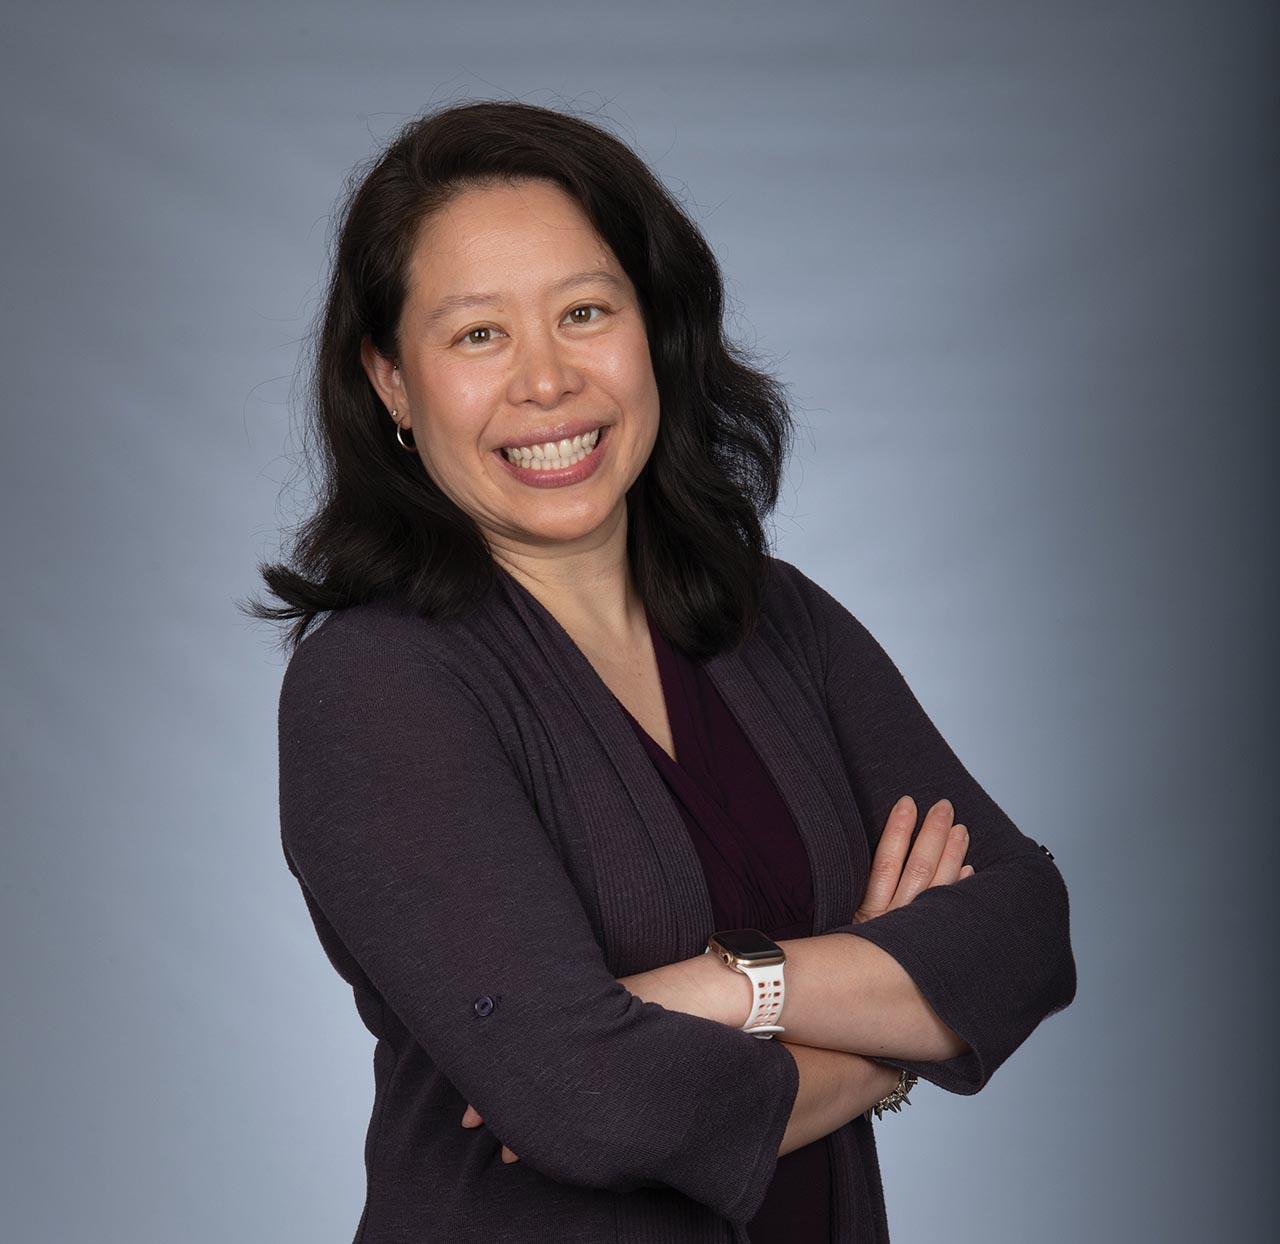 Dr. Rosie Hauck